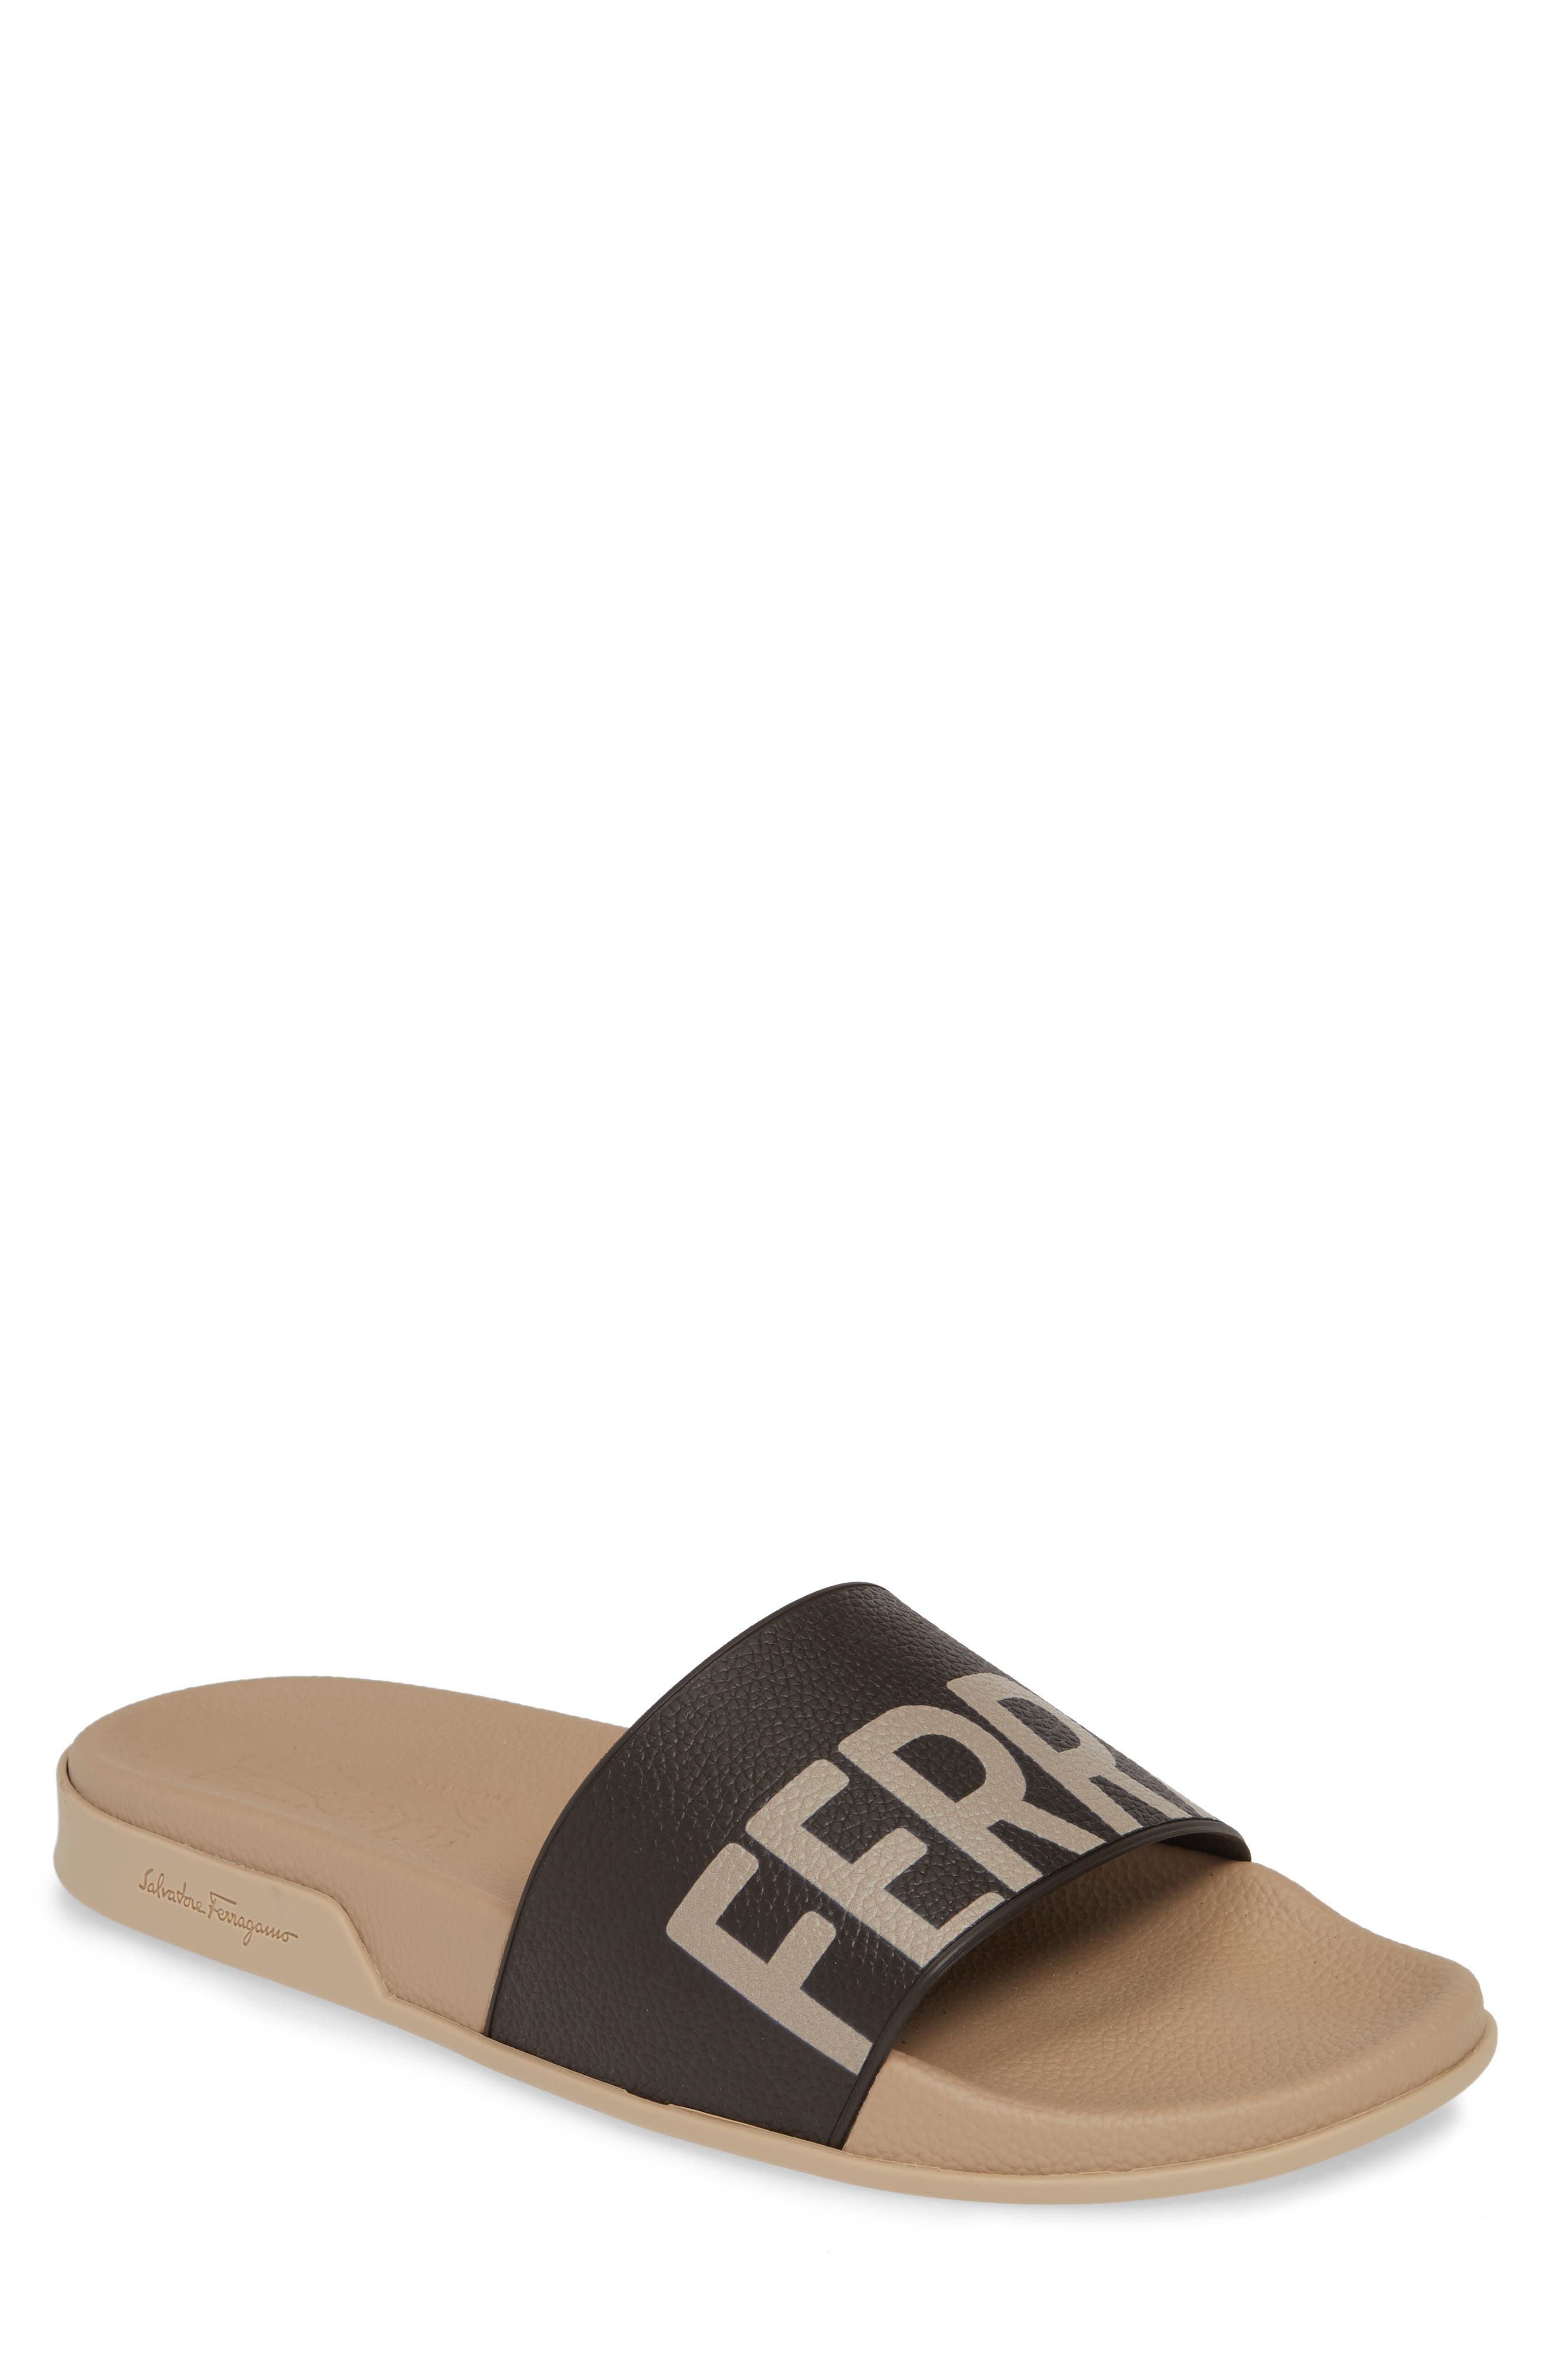 09eba0a6ccea Men s Salvatore Ferragamo Sandals